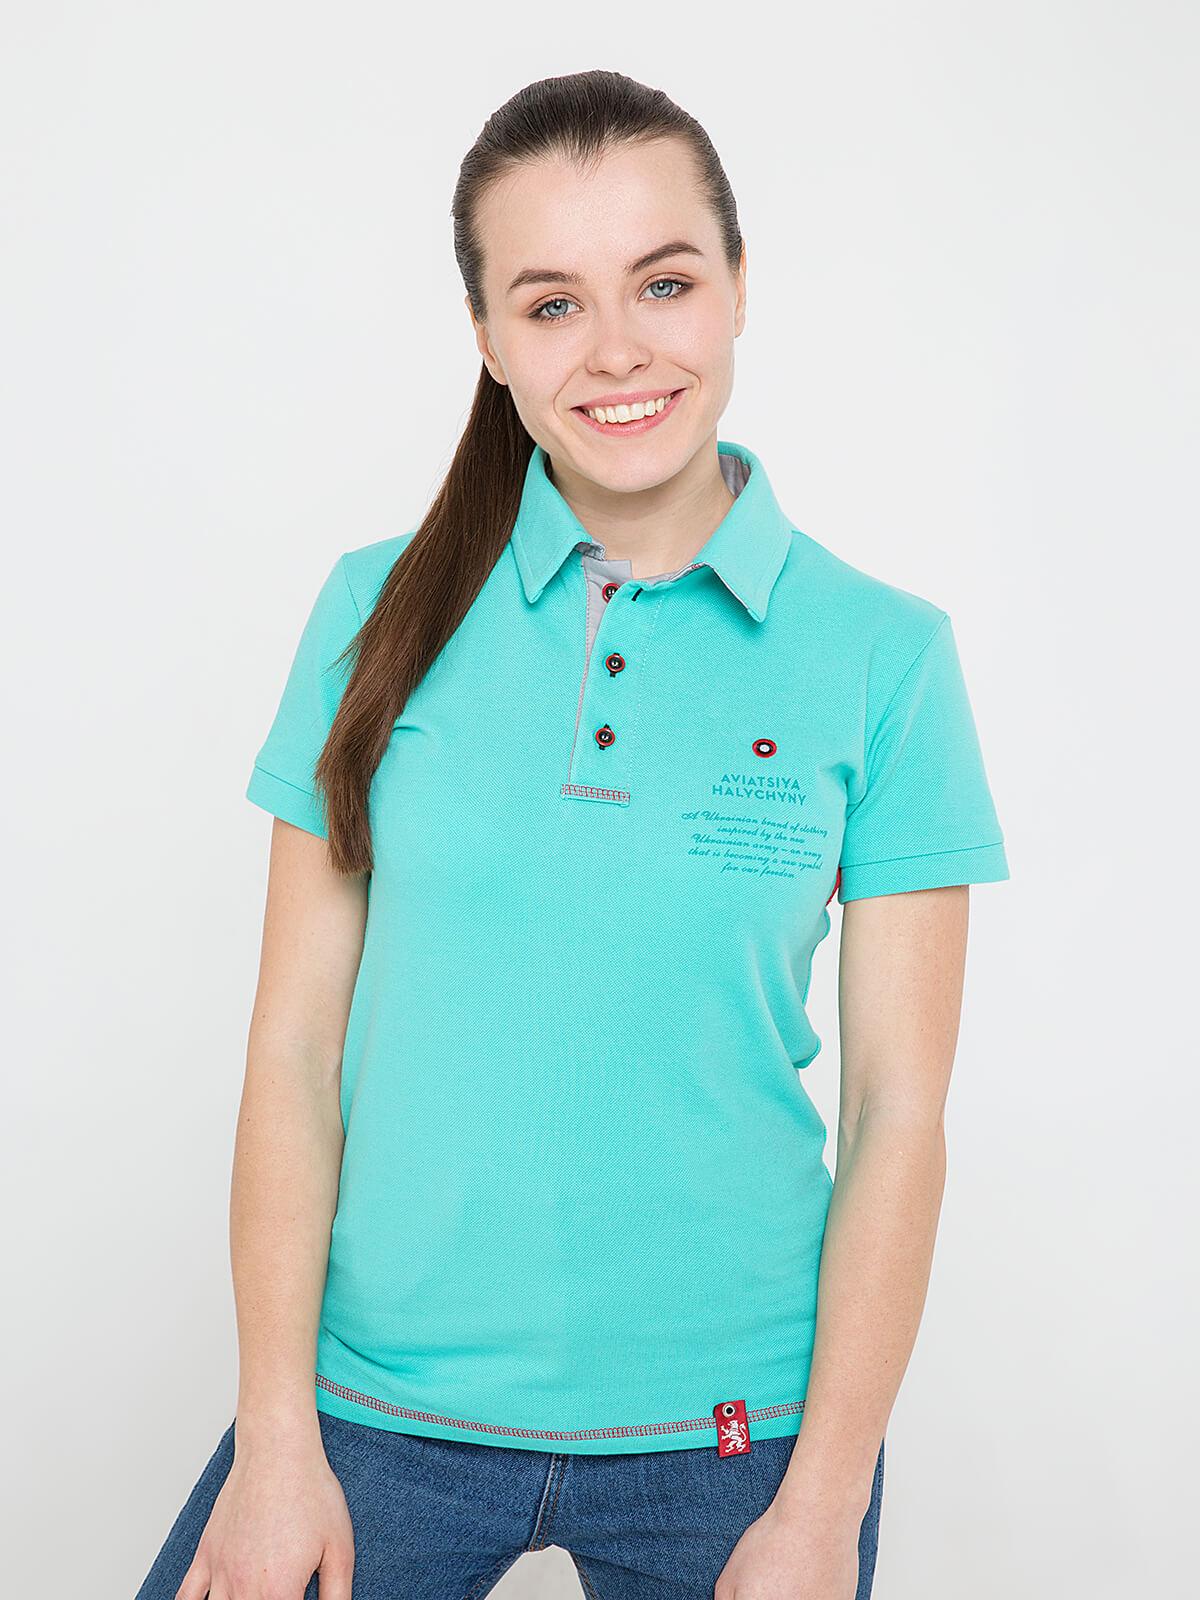 Women's Polo Shirt Wings. Color mint. Unisex polo (men's sizes).